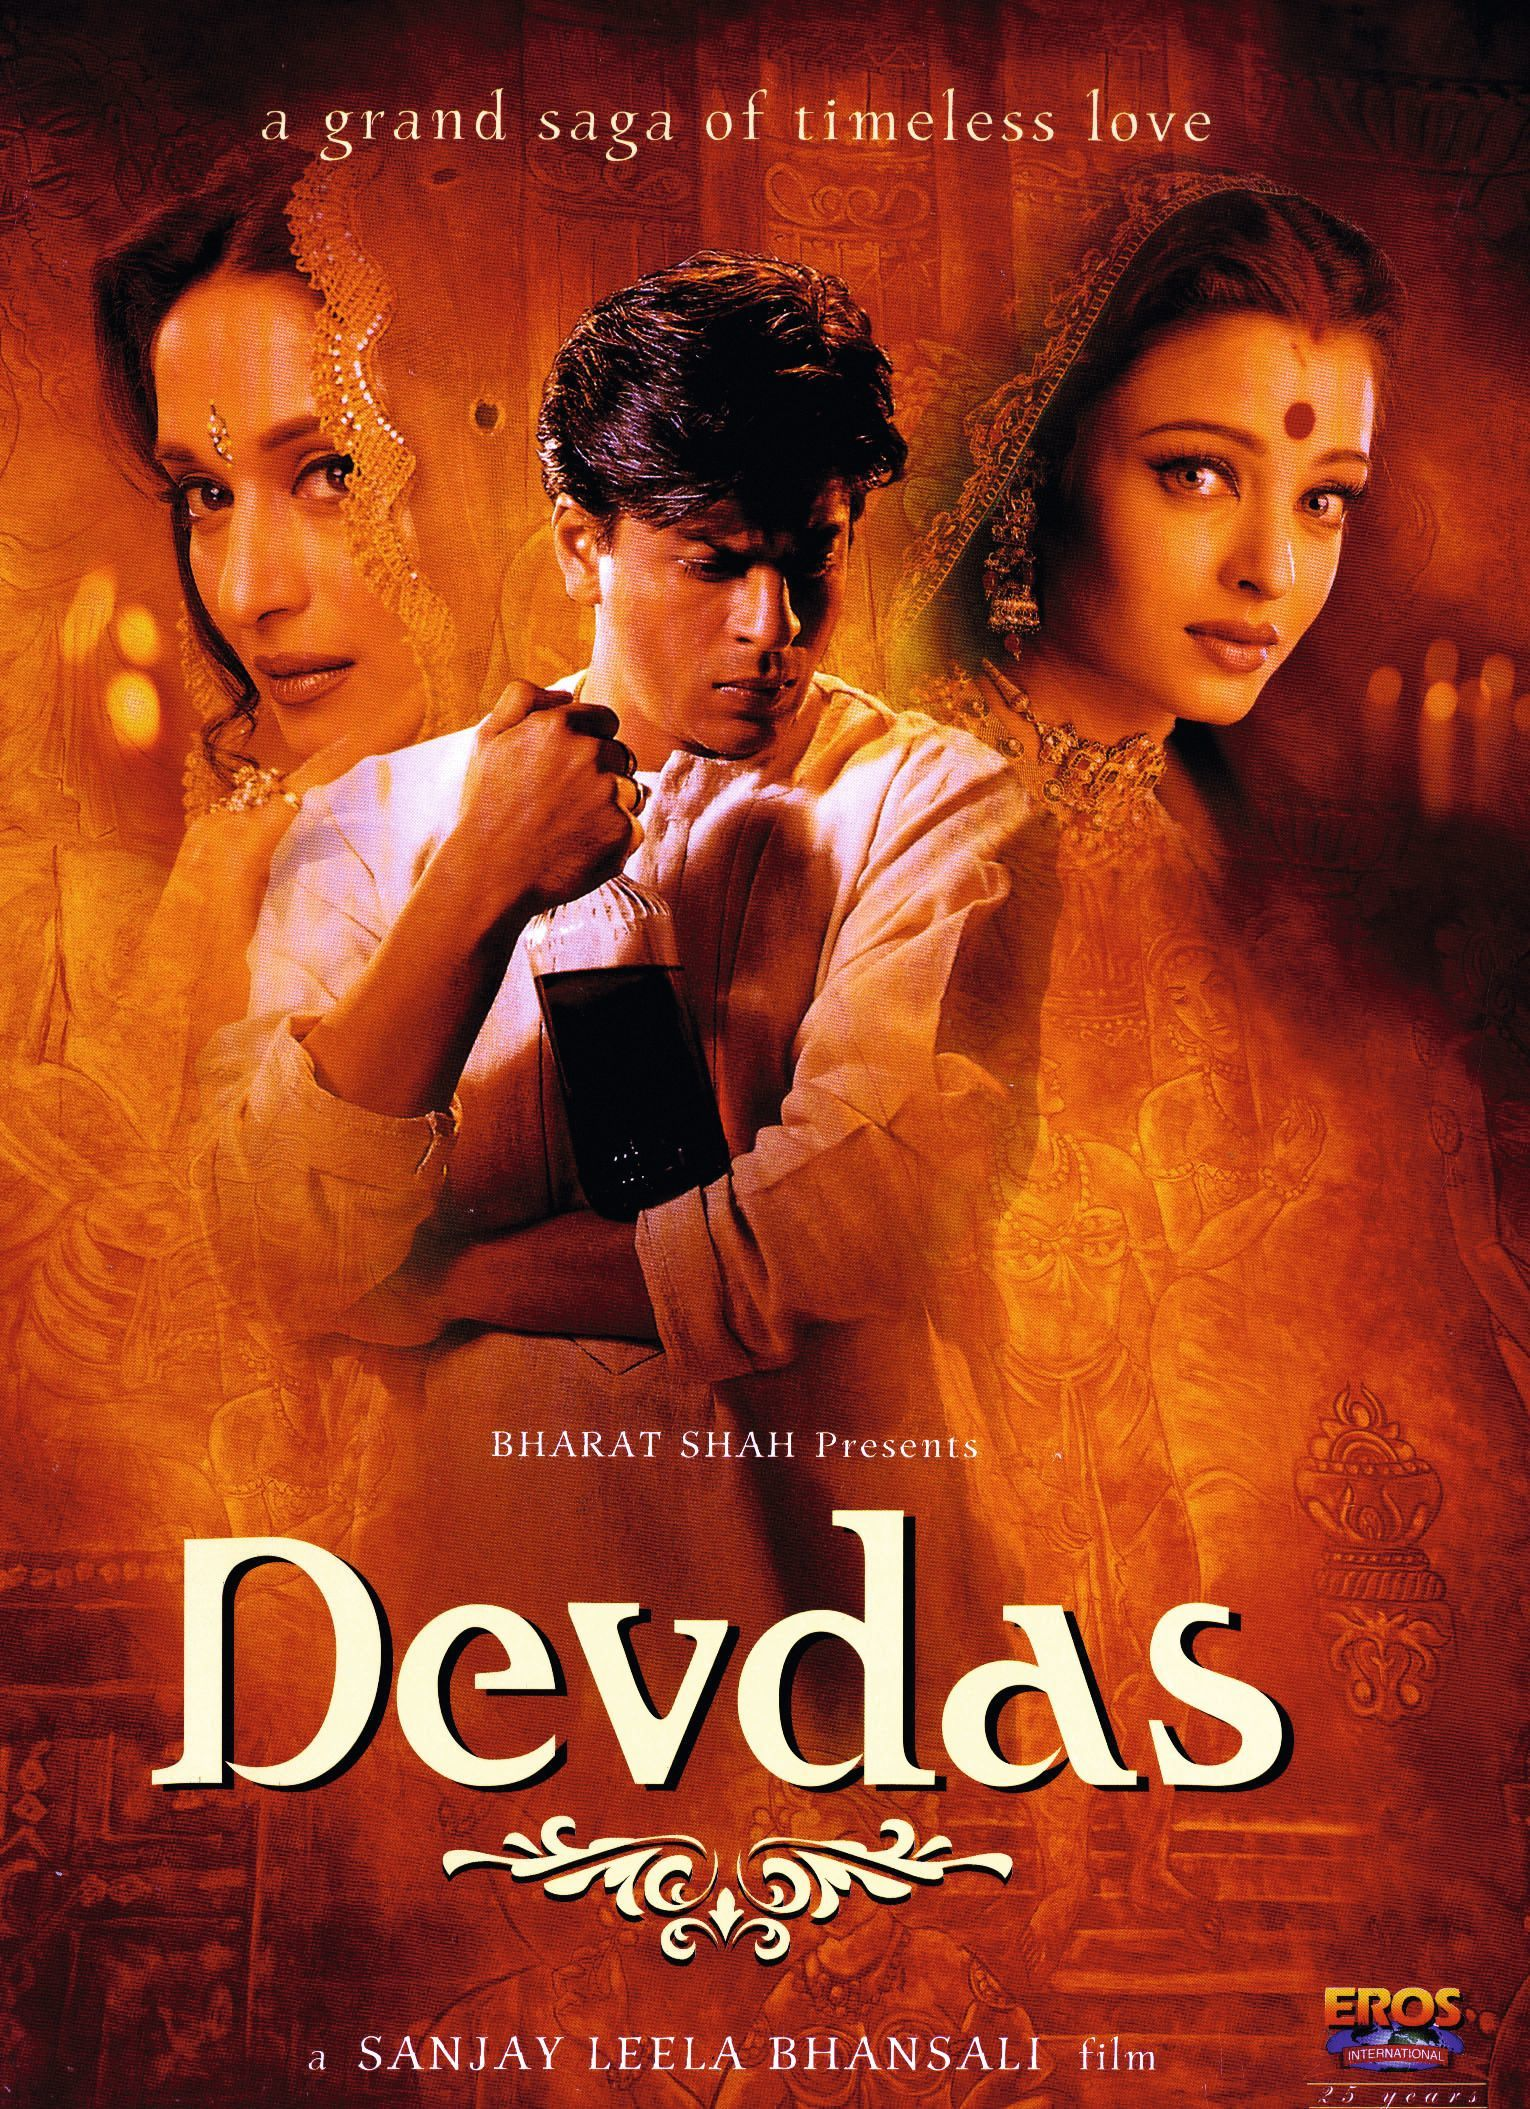 Devdas, by Sanjay Leela Bhansali, 2002